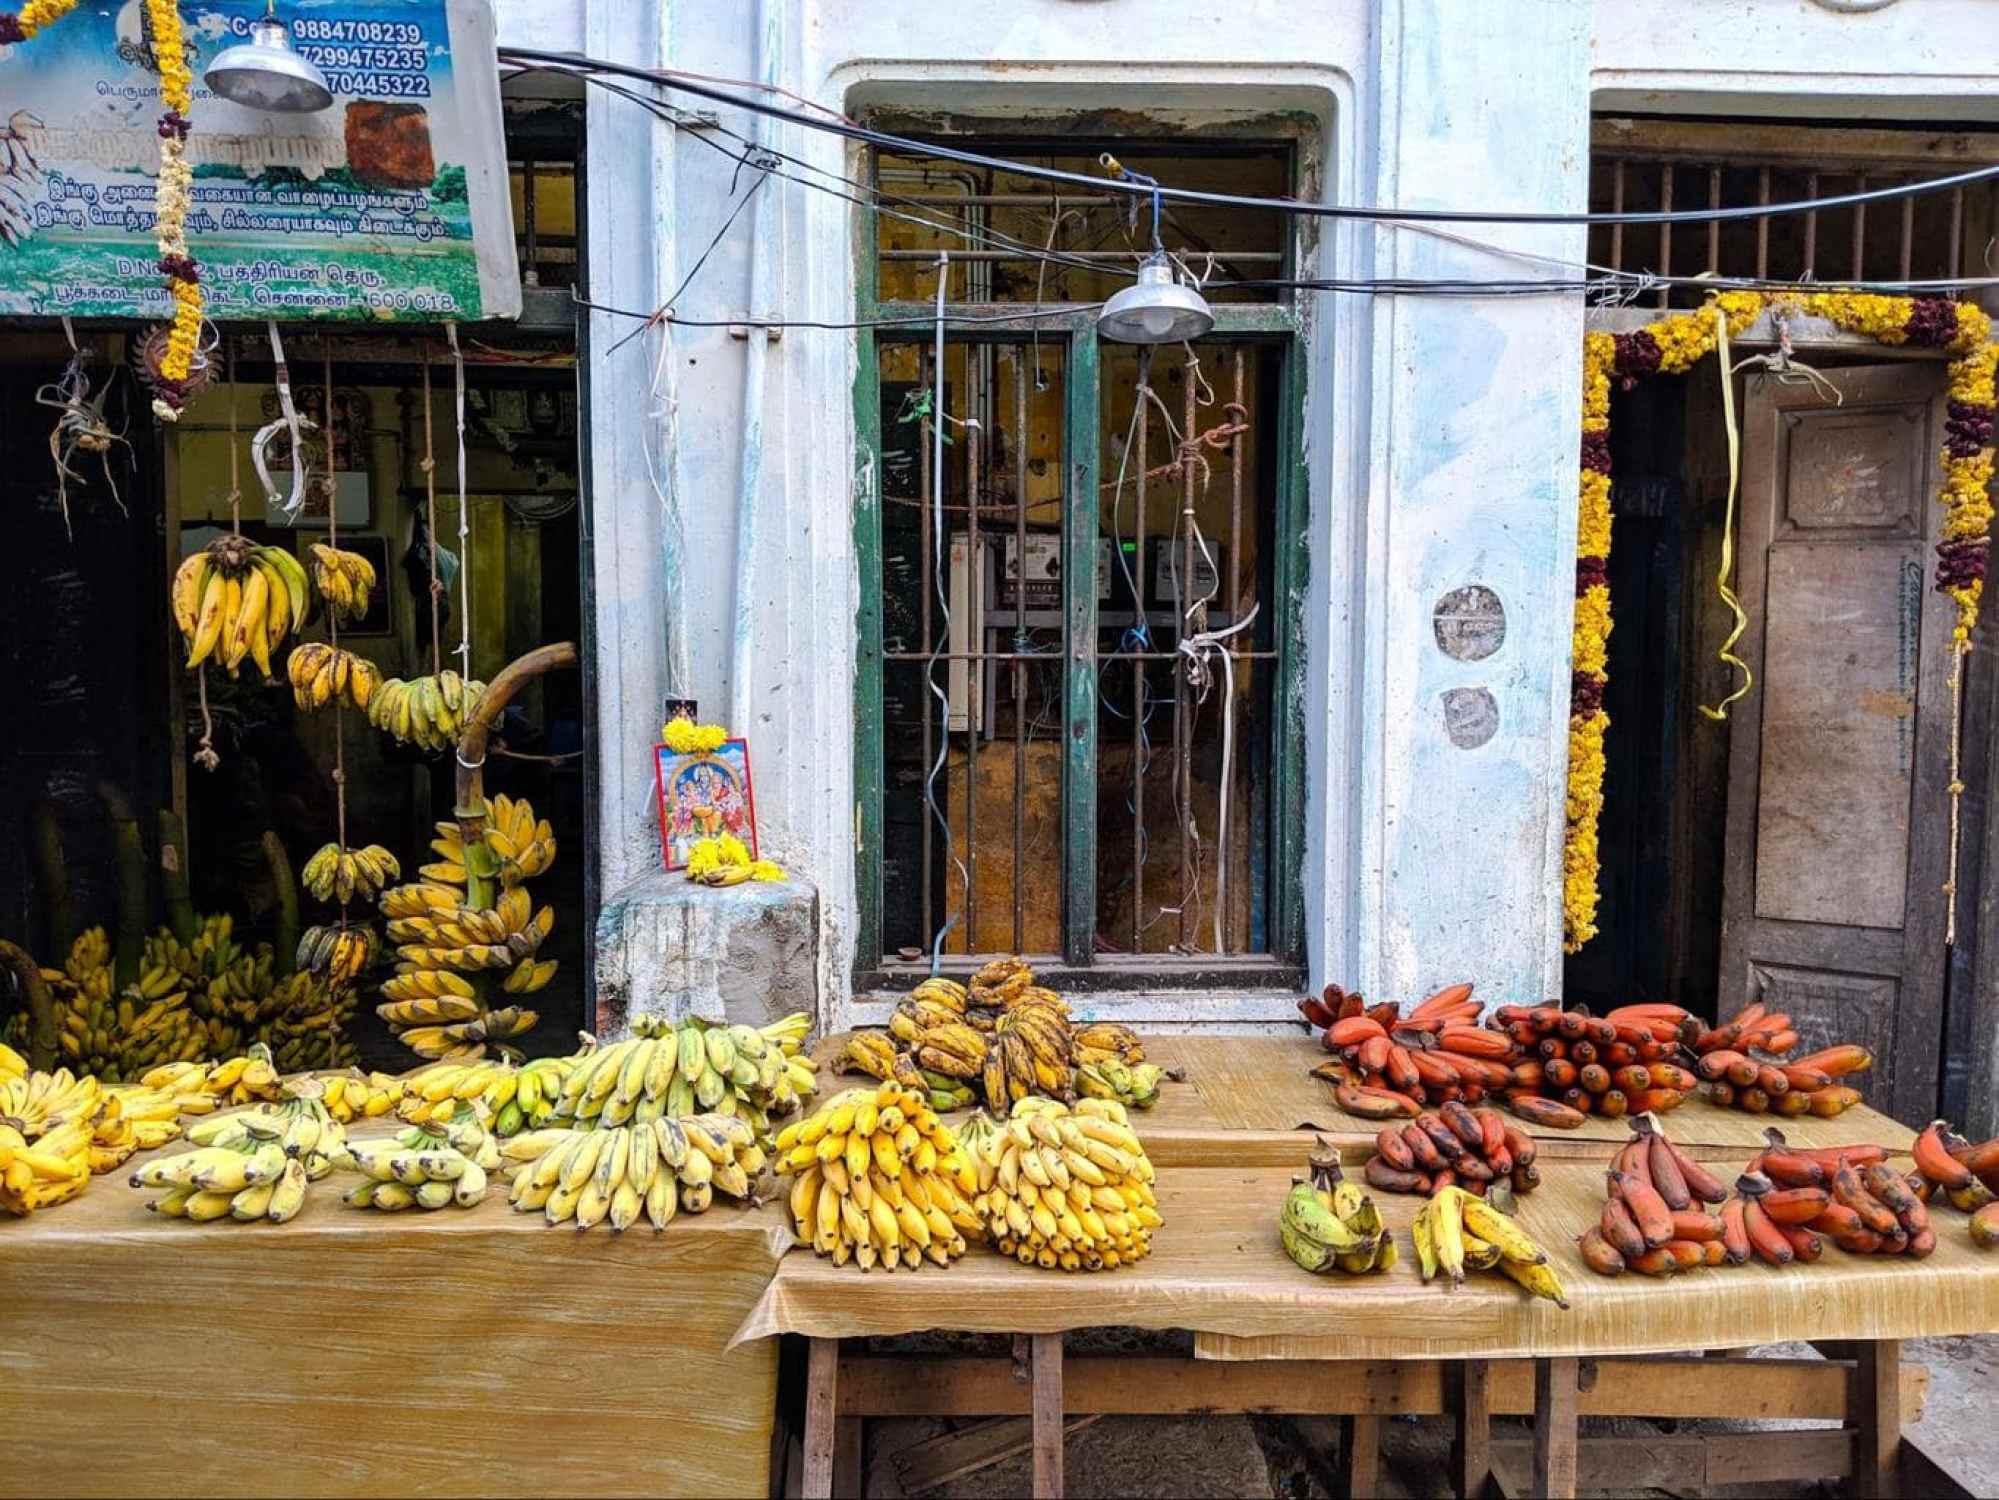 Marimuthu banana shop